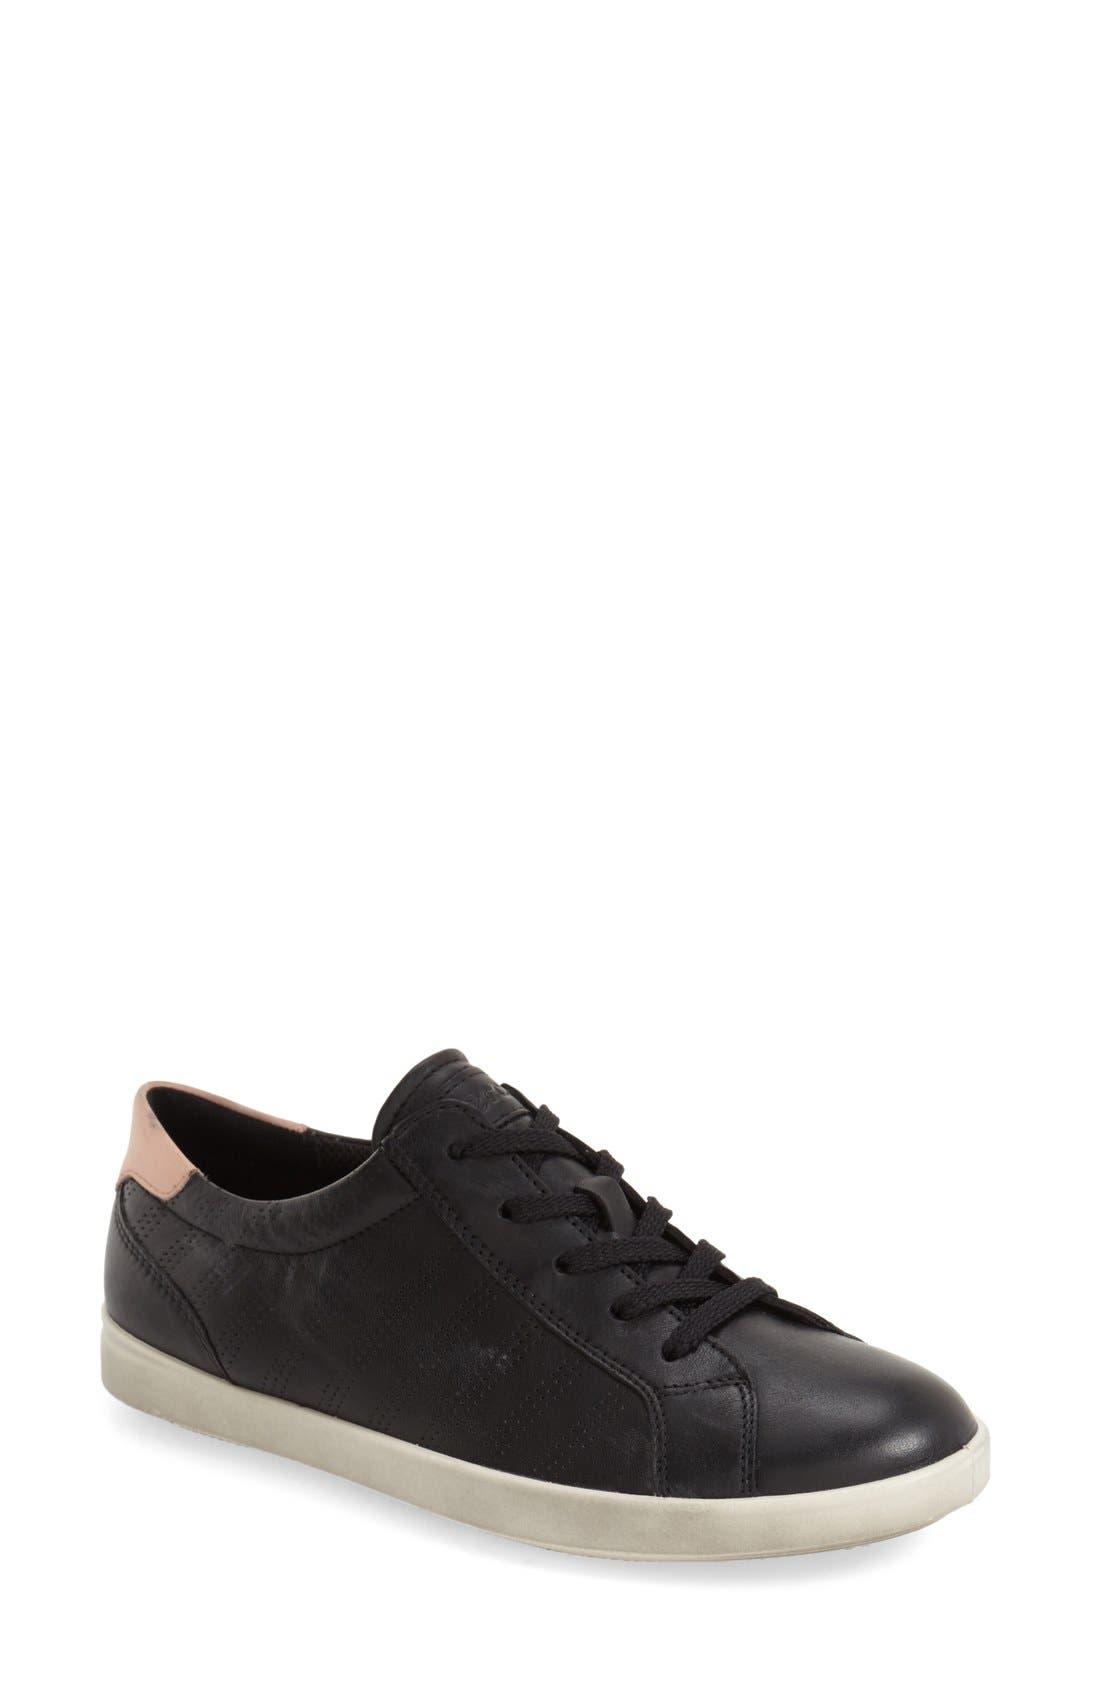 Alternate Image 1 Selected - ECCO 'Amiee' Sneaker (Women)